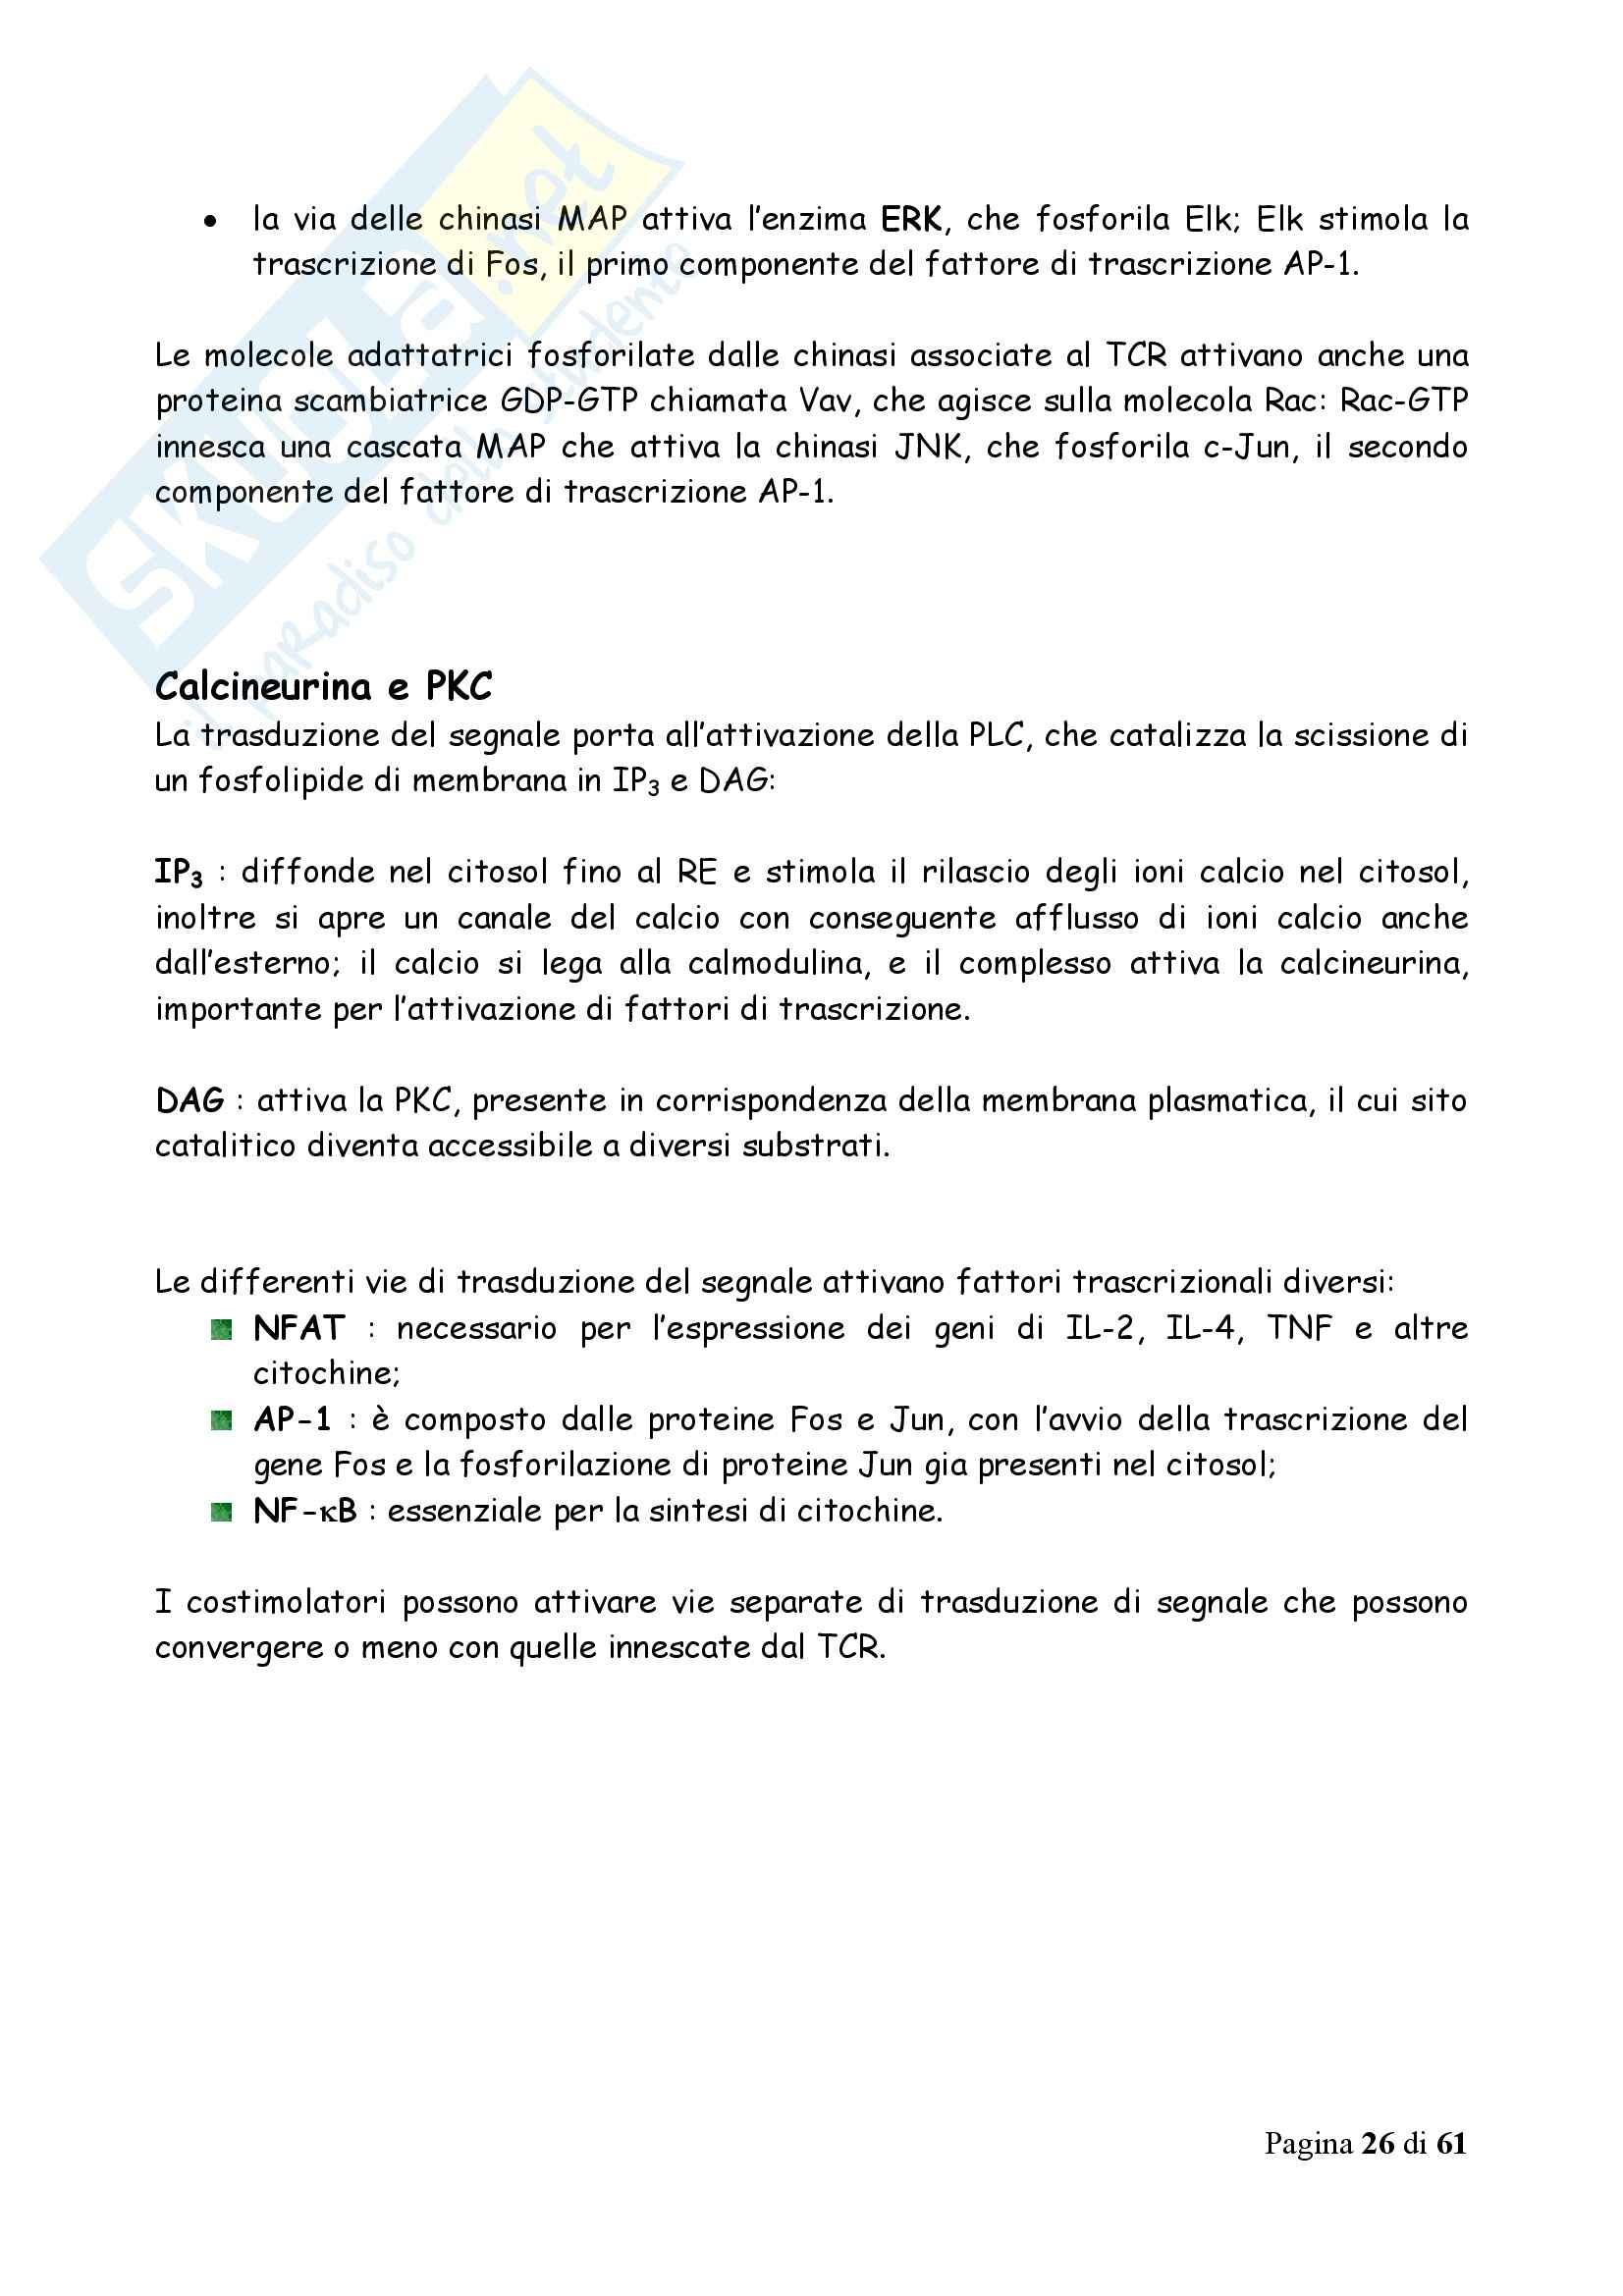 Immunologia - Appunti Pag. 26